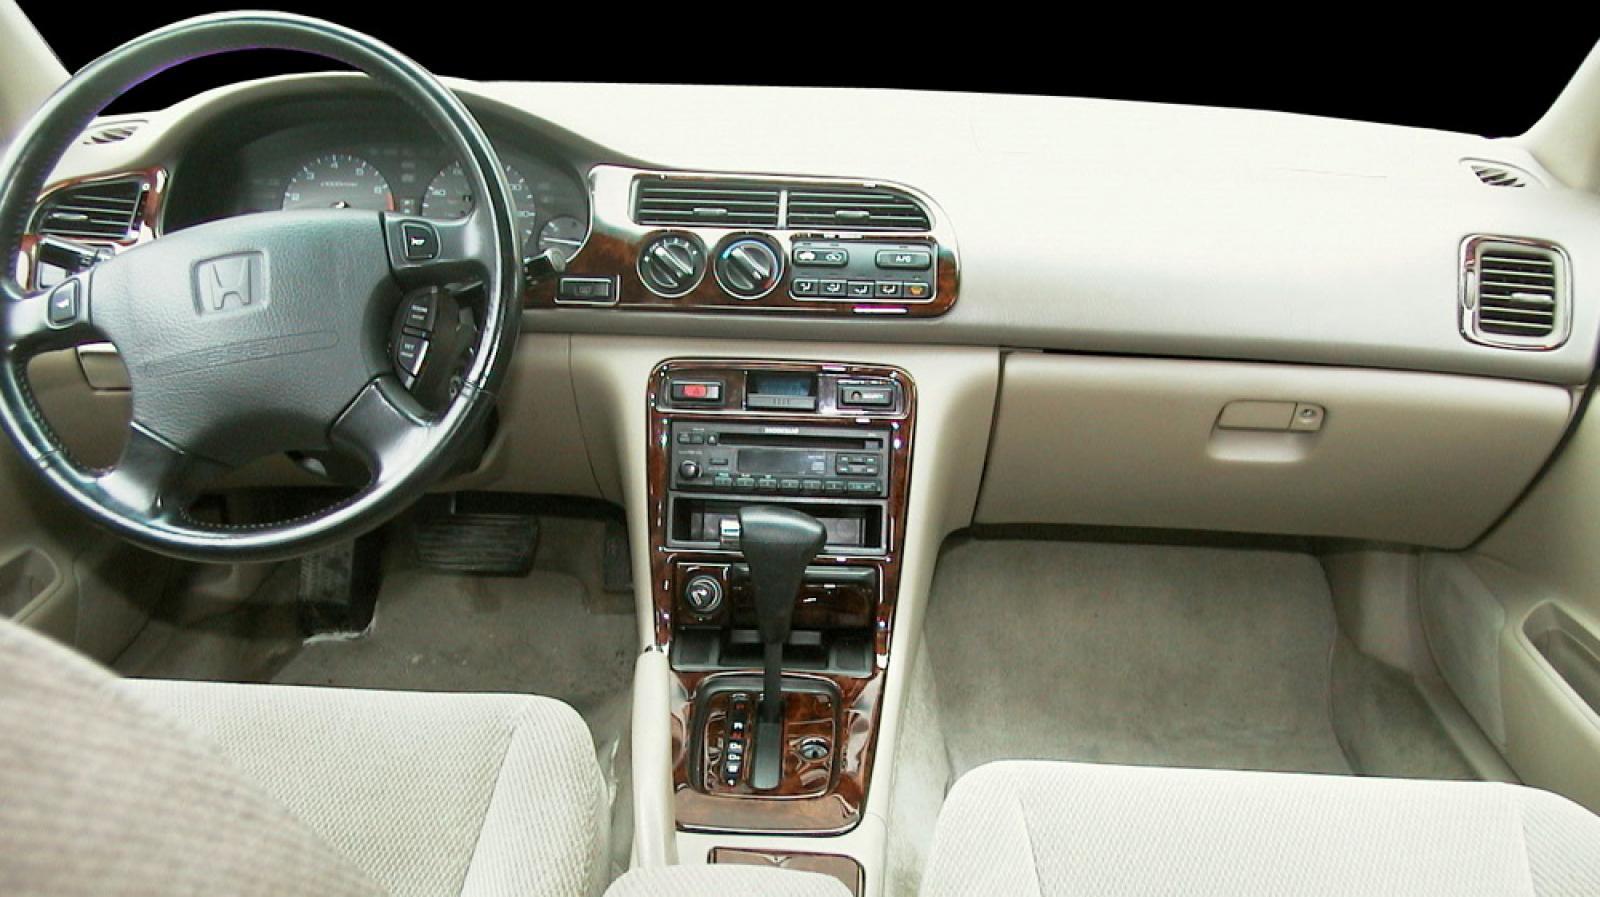 Honda honda accord 1996 : 1996 Honda Accord - Information and photos - ZombieDrive